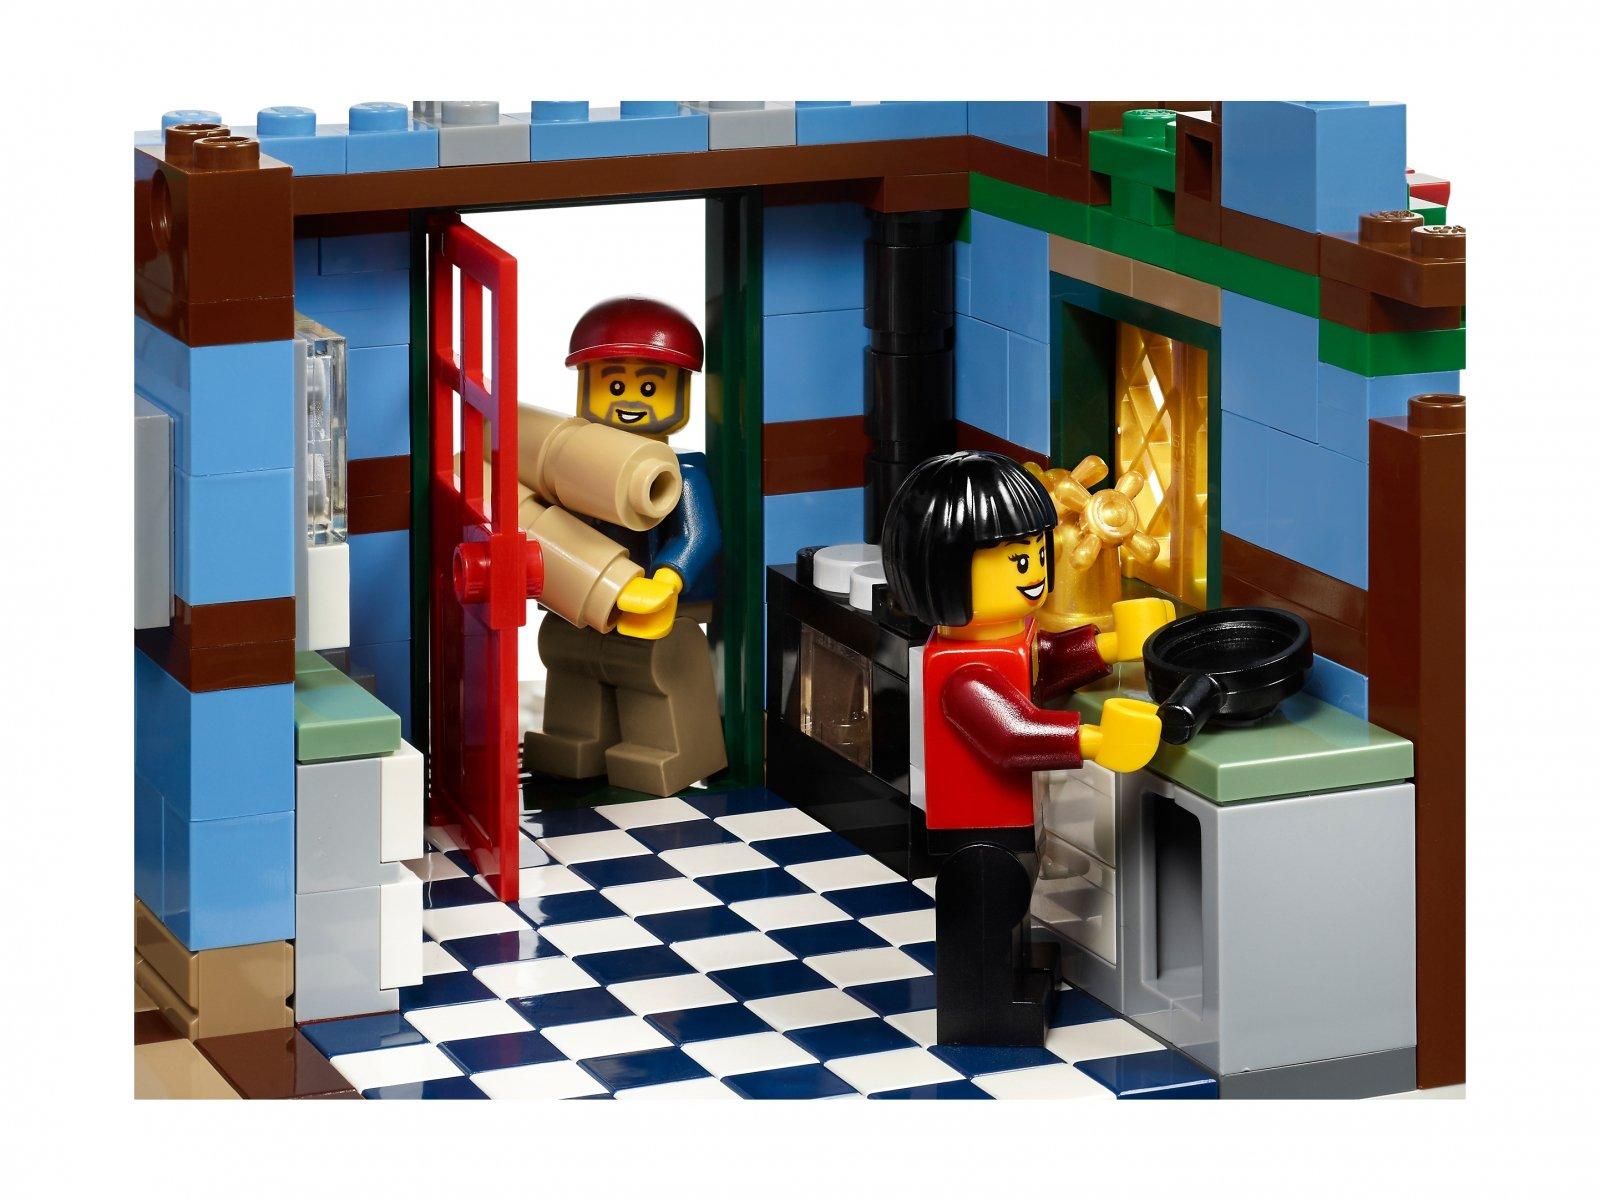 LEGO Creator Expert Zimowa chata 10229